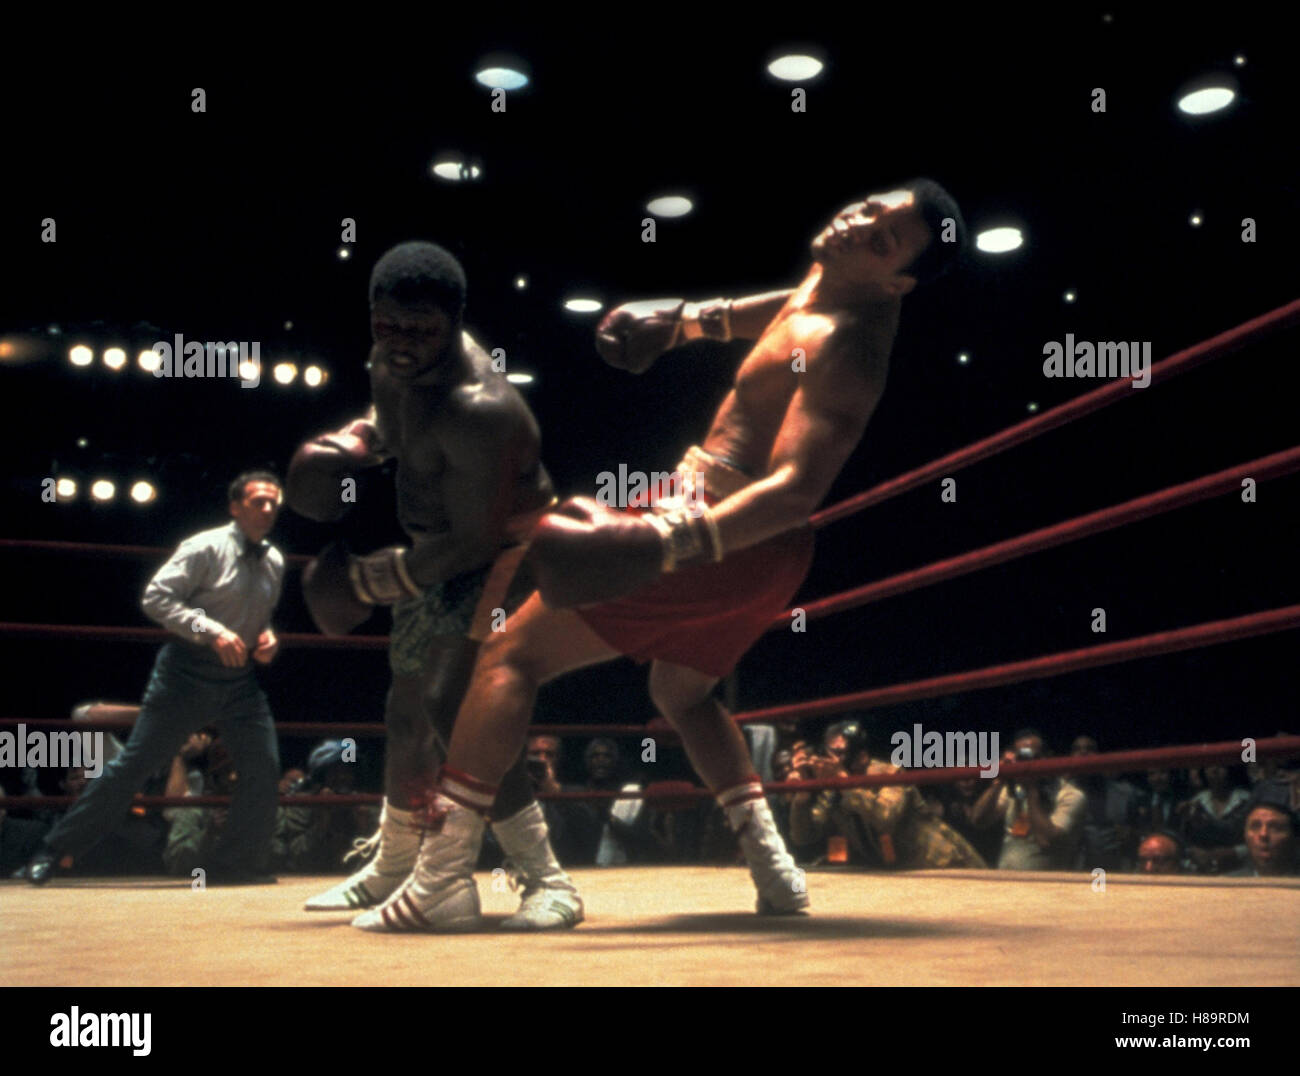 Ali, (ALI) USA 2001, Regie: Michael Mann, JAMES TONEY, WILL SMITH, (Joe Frazier / Muhammad Ali) Stichwort: Boxring, - Stock Image